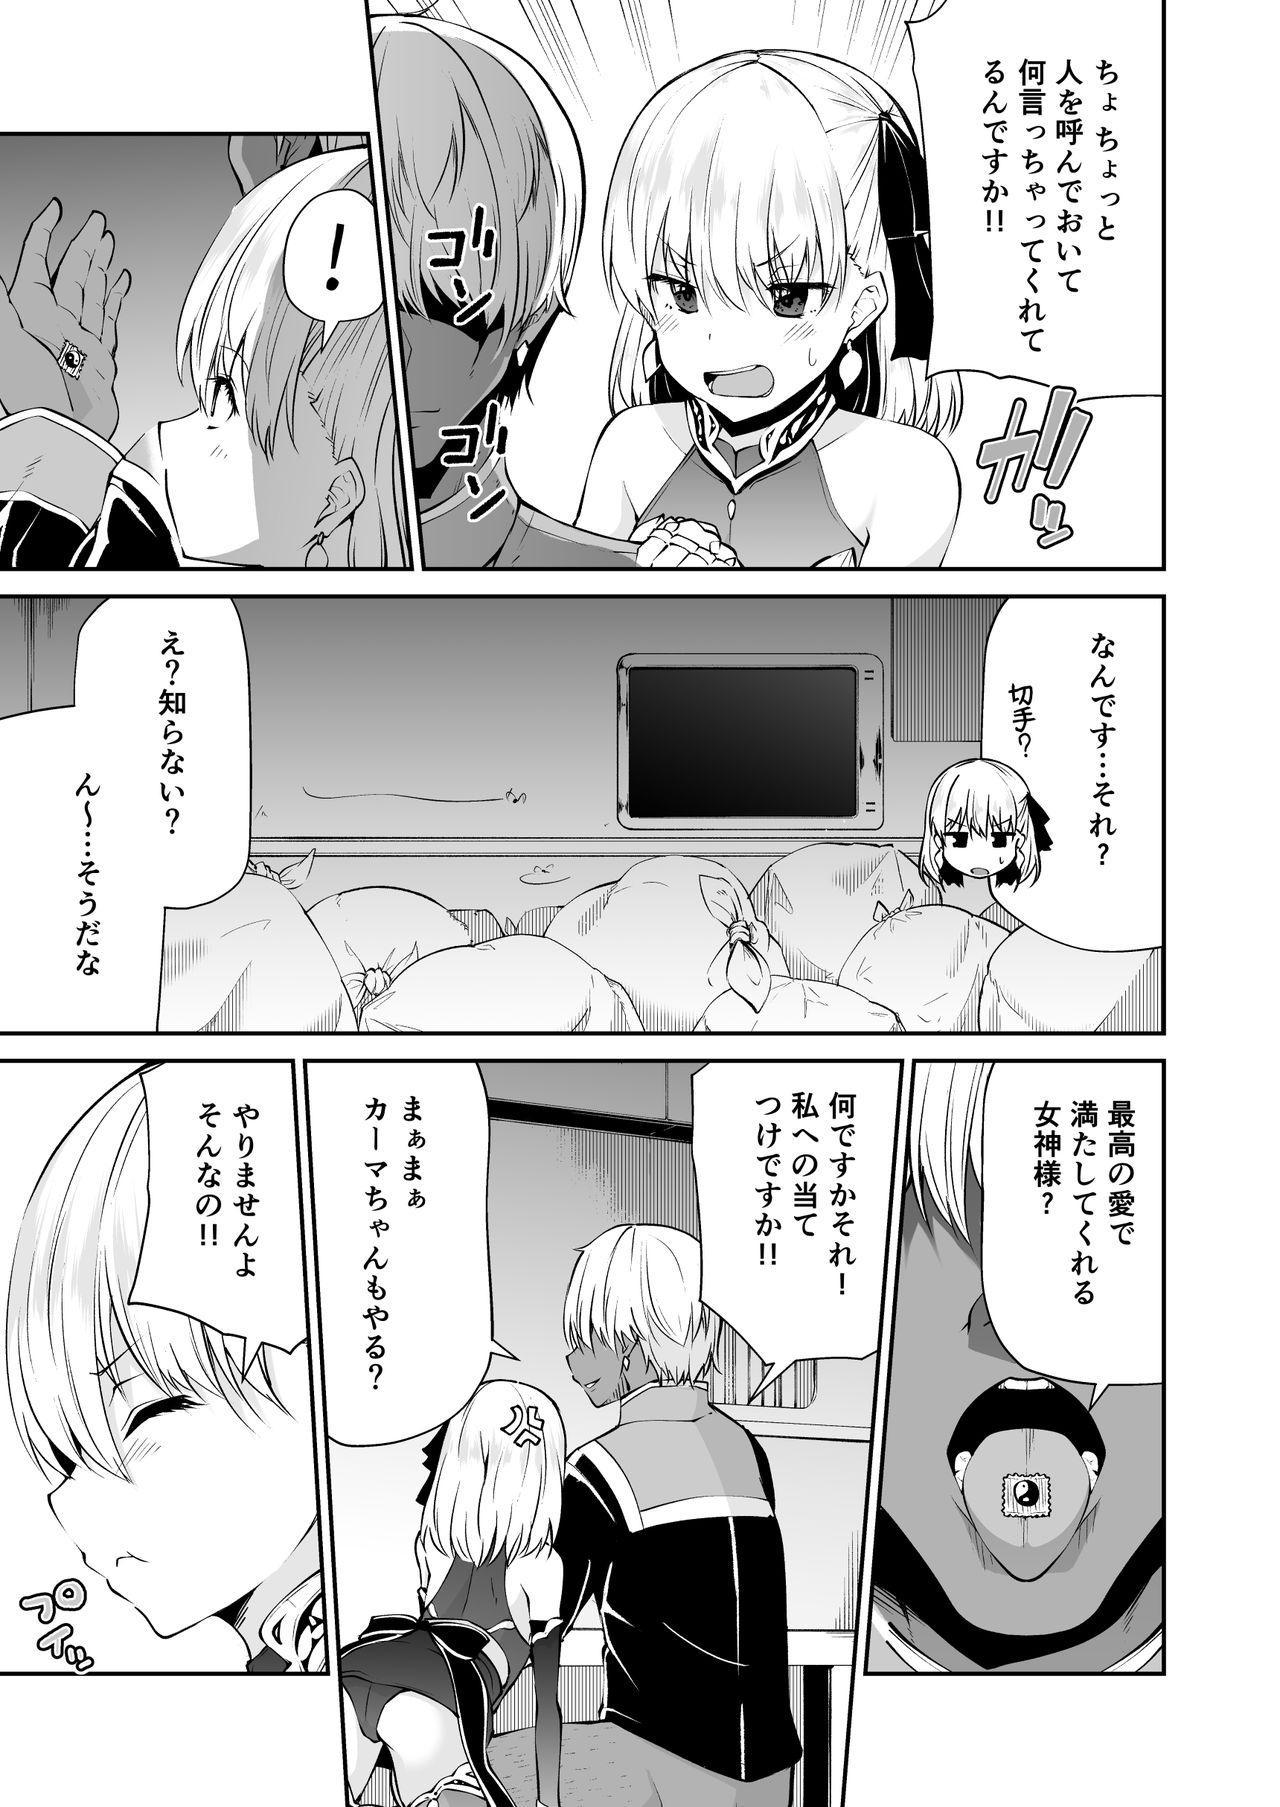 [Kitsuneya (Leafy)] Kama-chan to Love-prescription (Fate/Grand Order) [Digital] 4